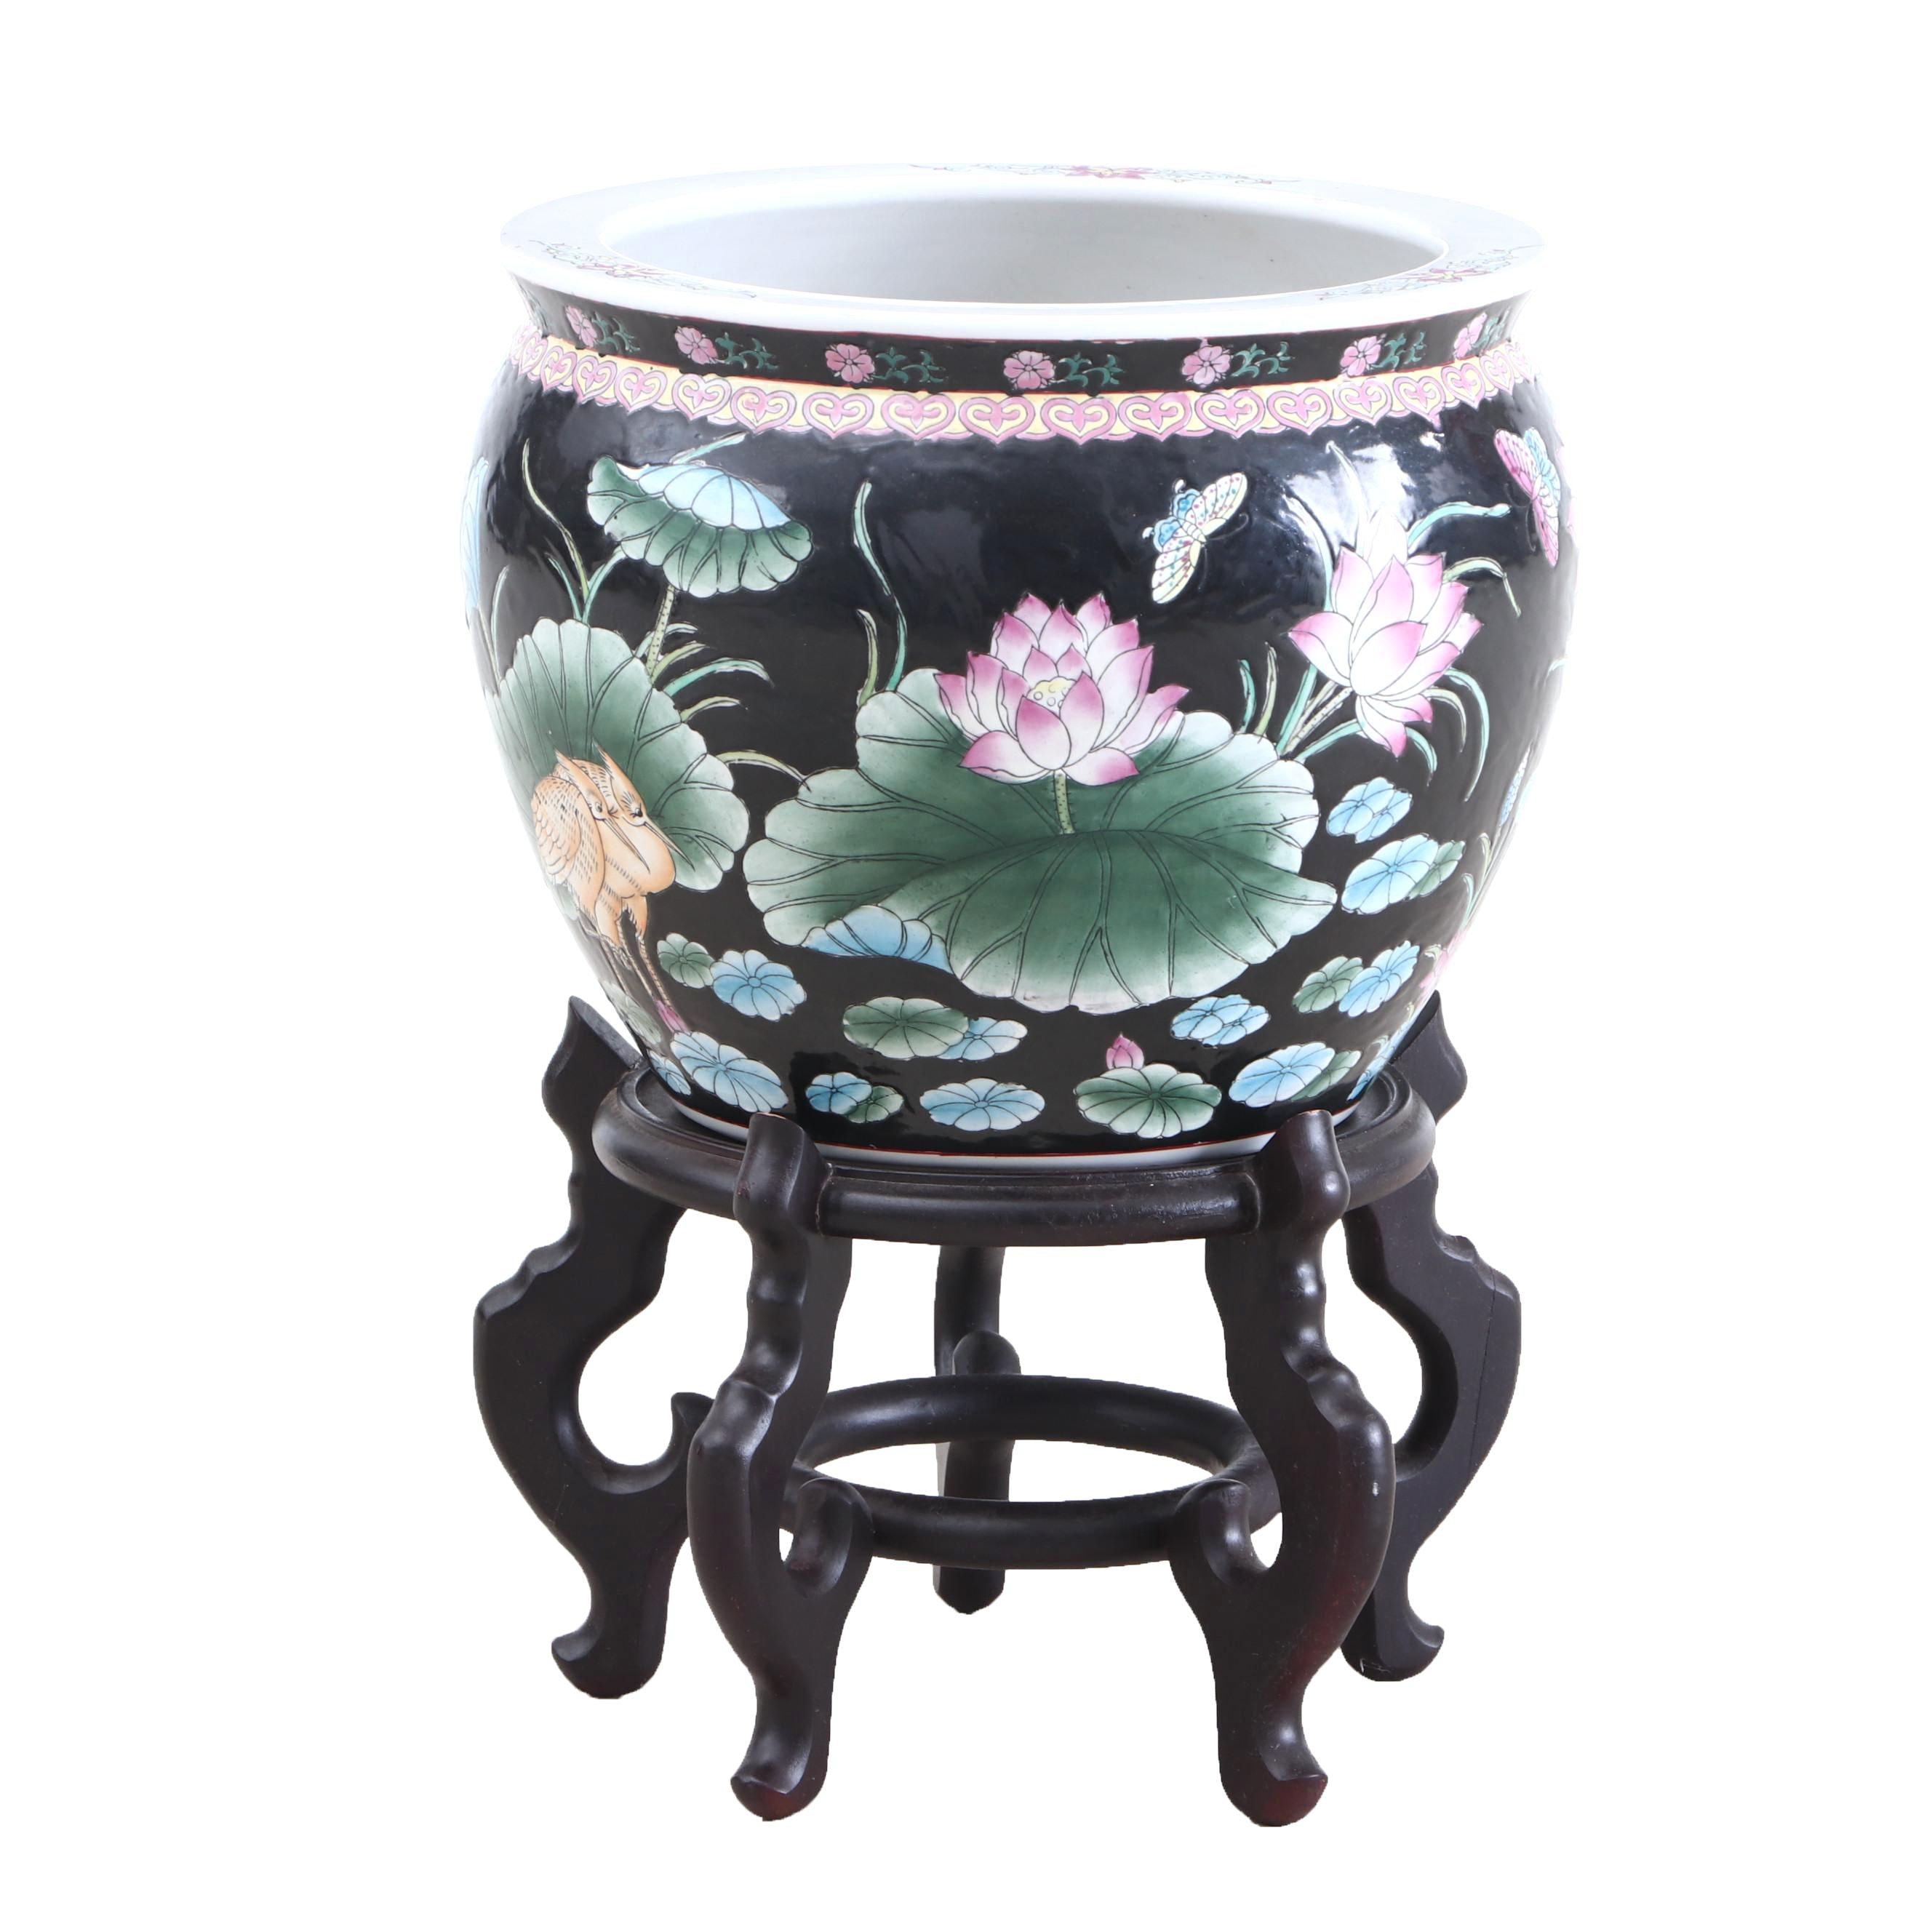 Chinese Motif Ceramic Goldfish Bowl and Mahogany Stand, Contemporary